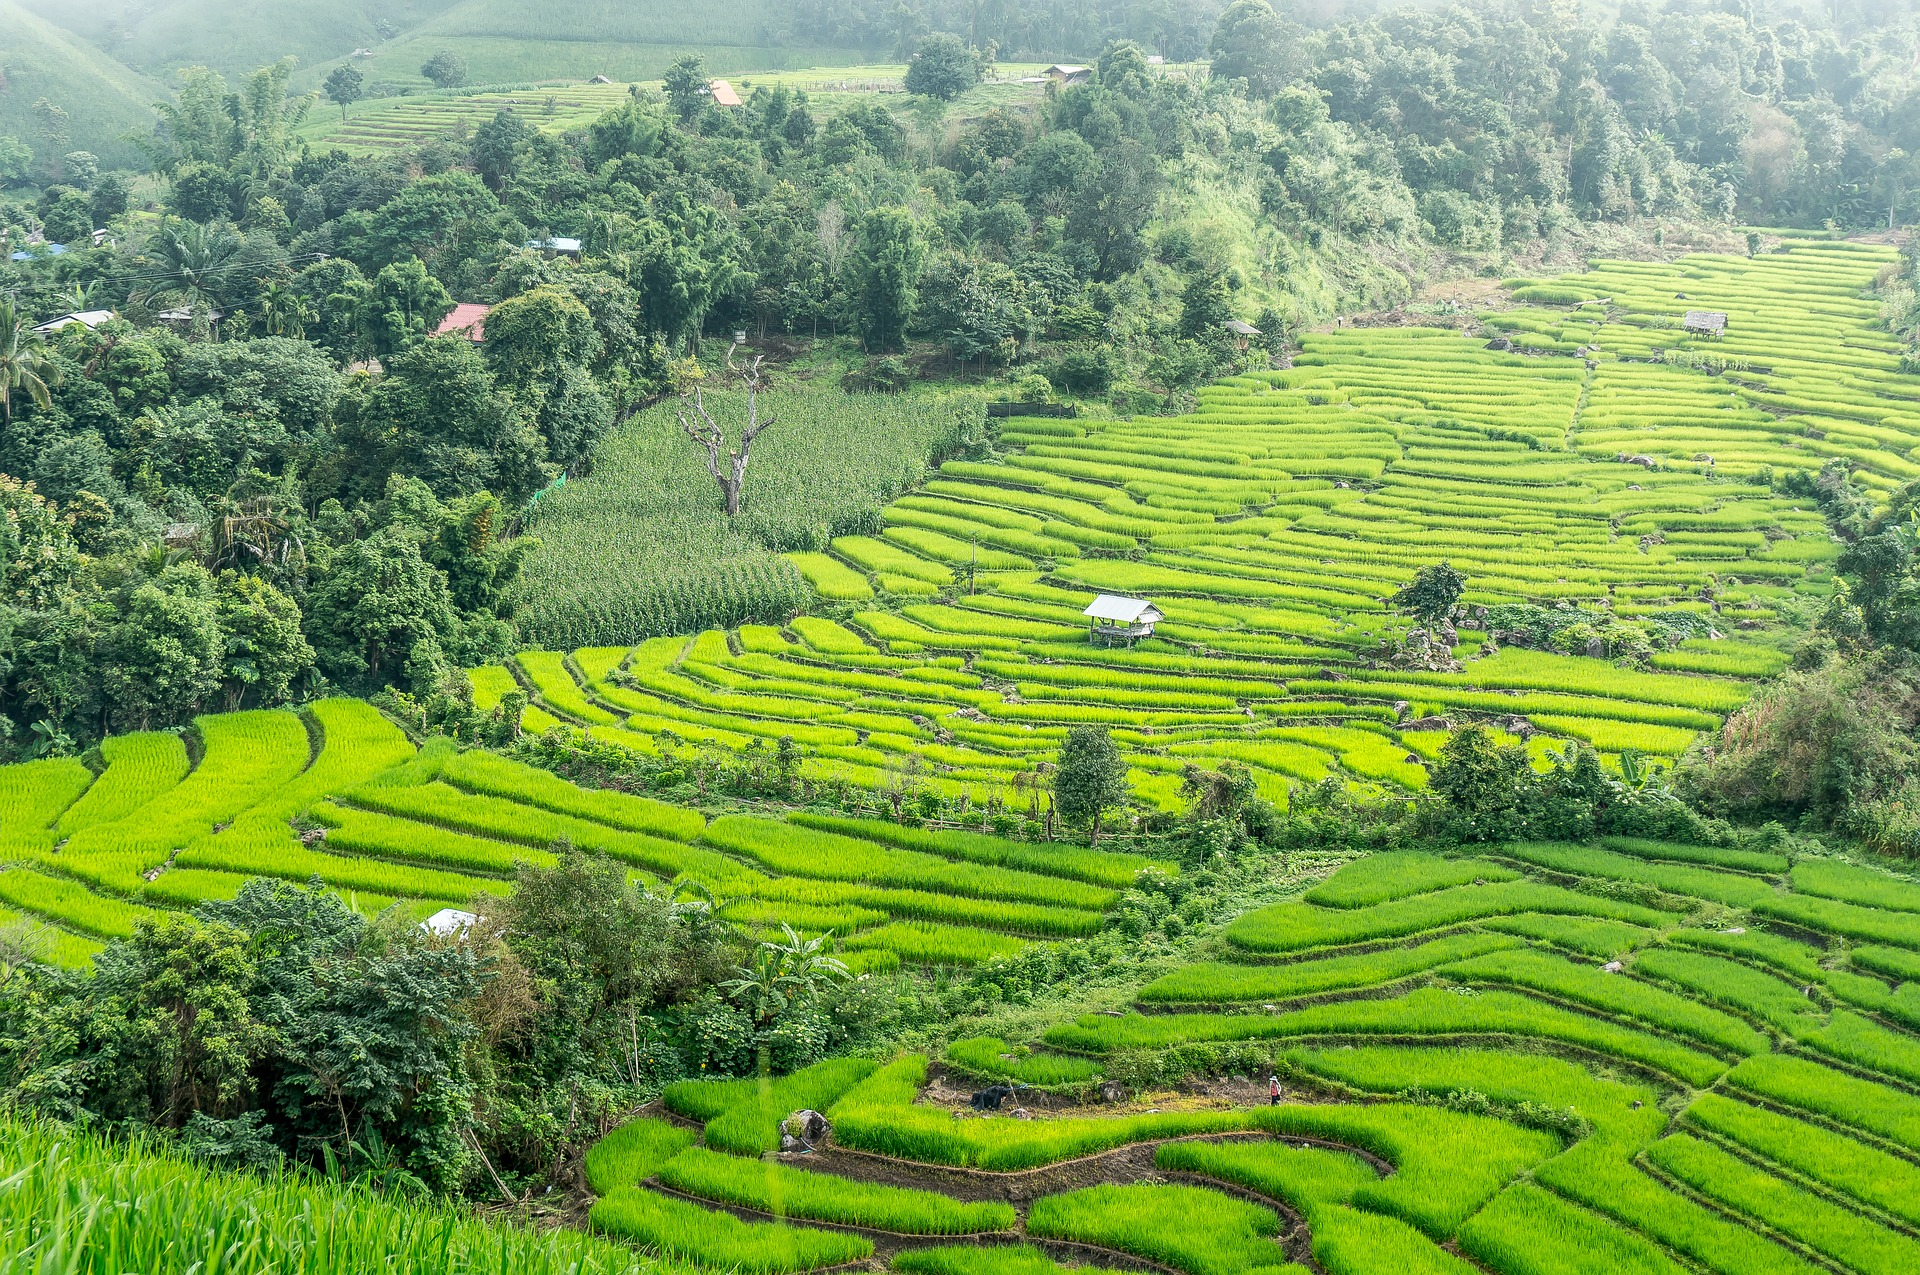 thailand rice-terraces-2224264_1920